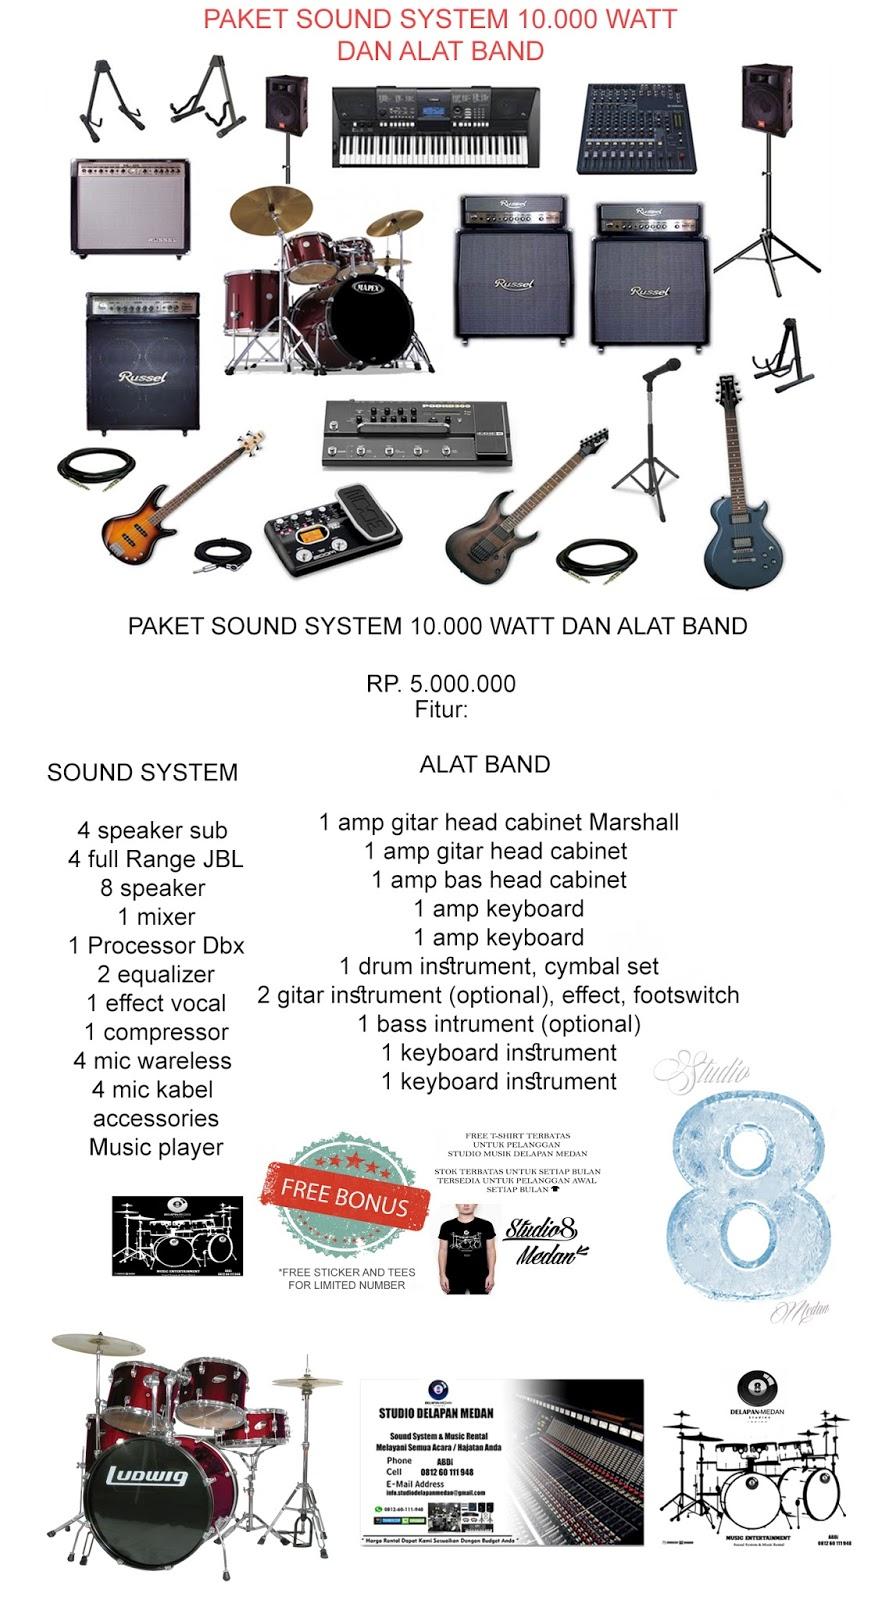 Studio Musik Delapan Medan 1 Set Paket Alat Keyboard Instrument